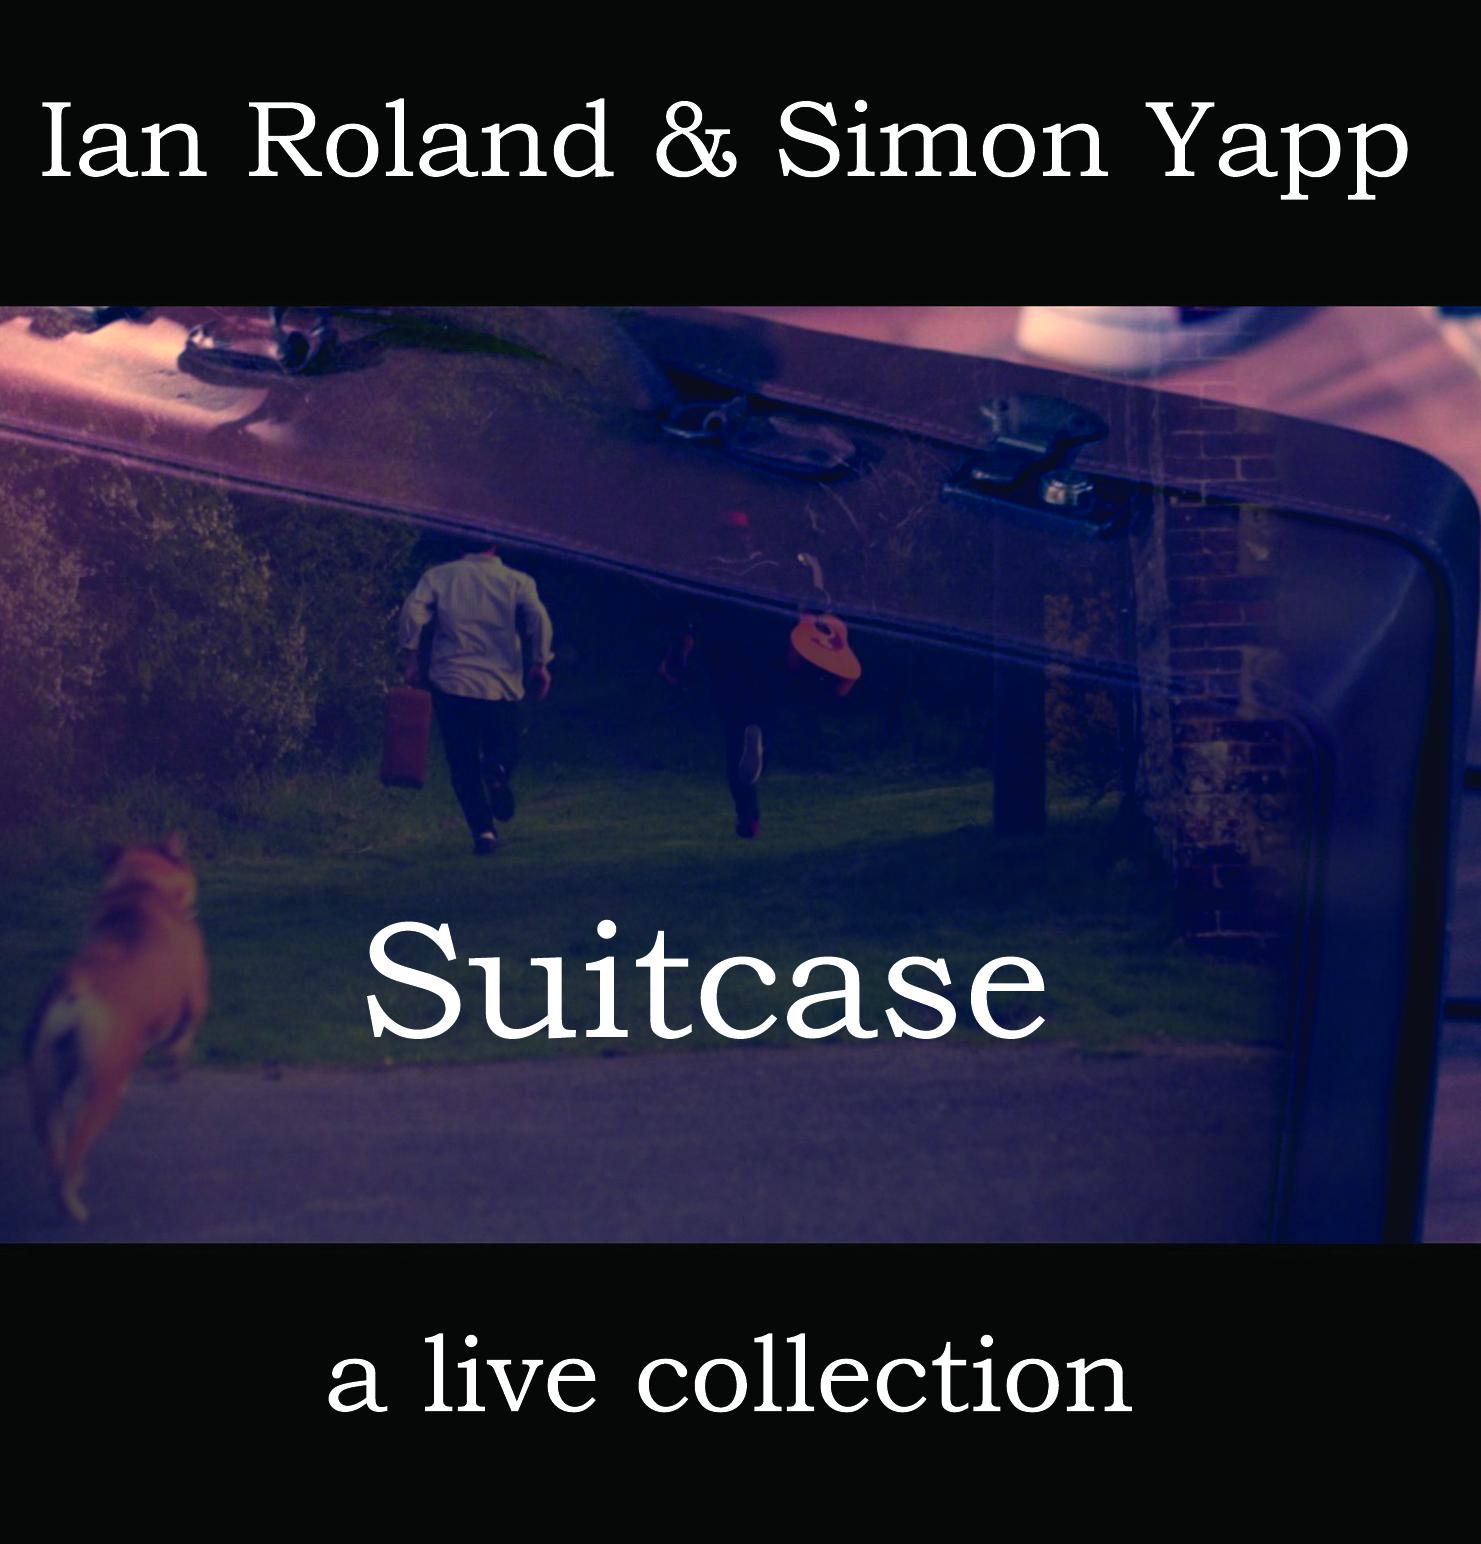 Suitcase_cardwallet_website_promo_front_cover_JPG